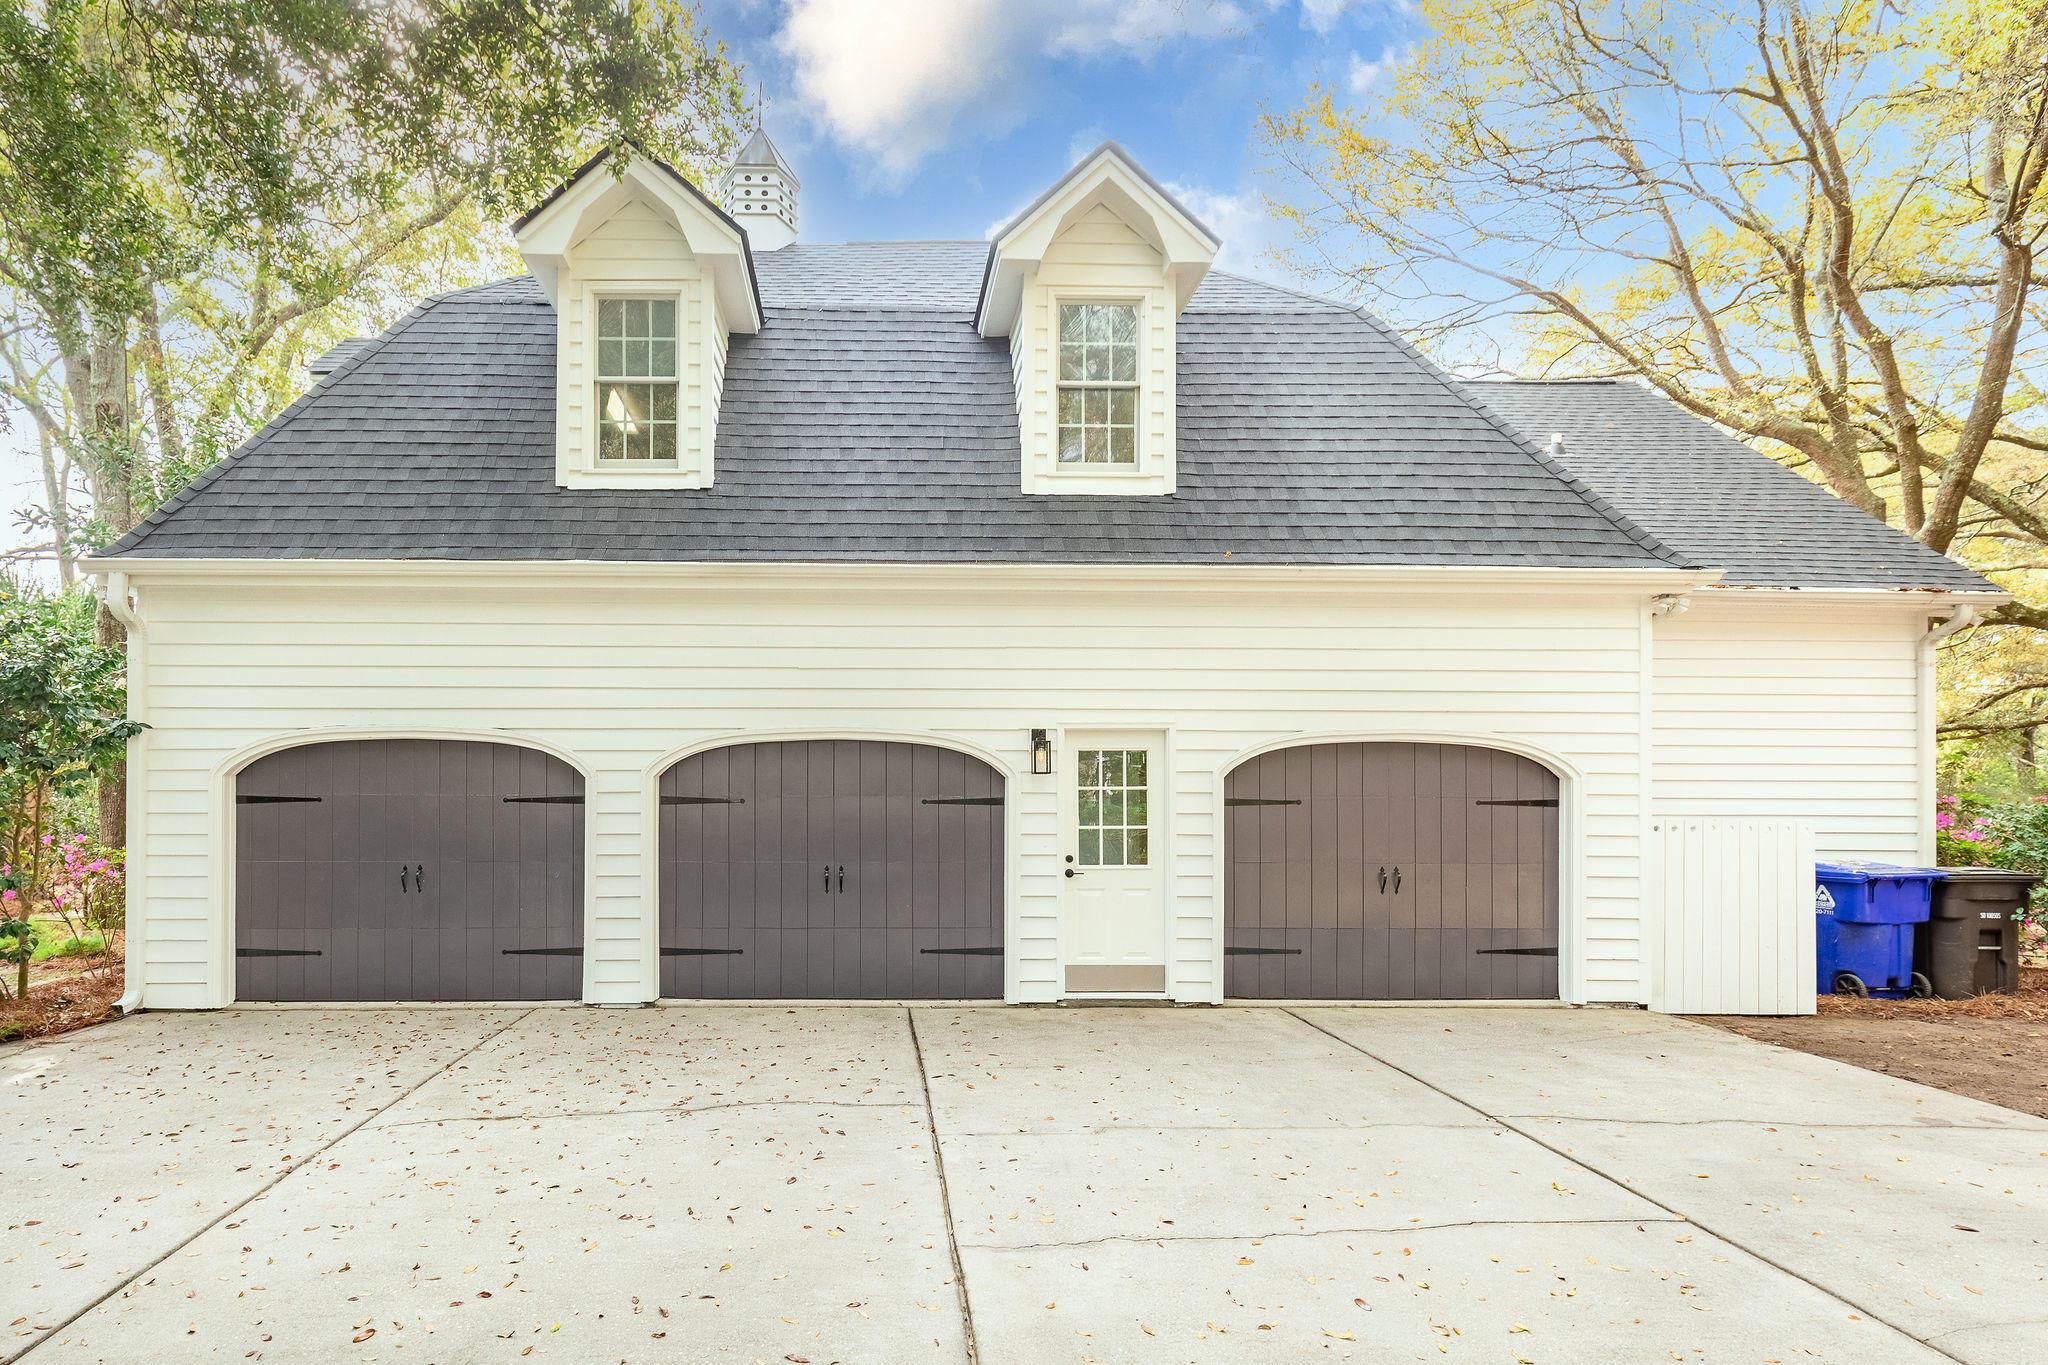 Old Mt Pleasant Homes For Sale - 1417 Edwards, Mount Pleasant, SC - 53